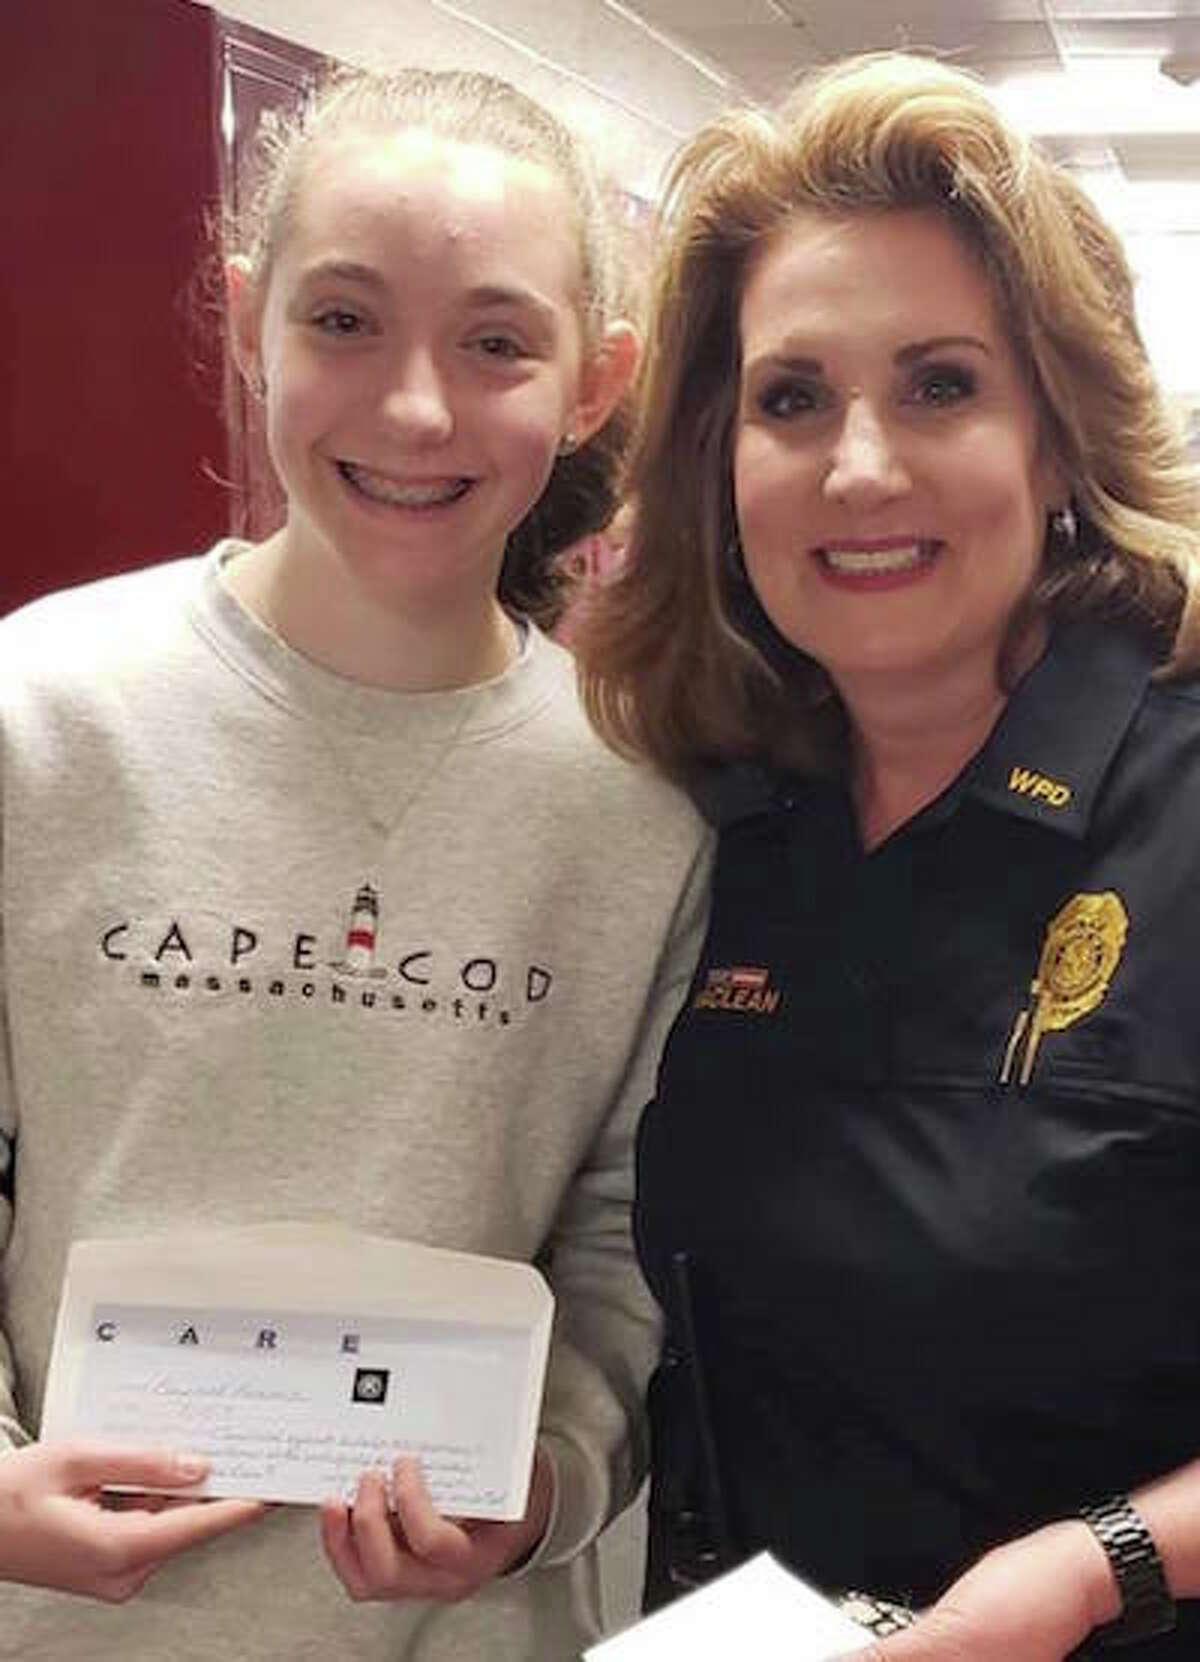 Middlebrook student Elizabeth Lamond with School Resource Officer Diane MacLean. - Wilton Police Dept. Facebook photo